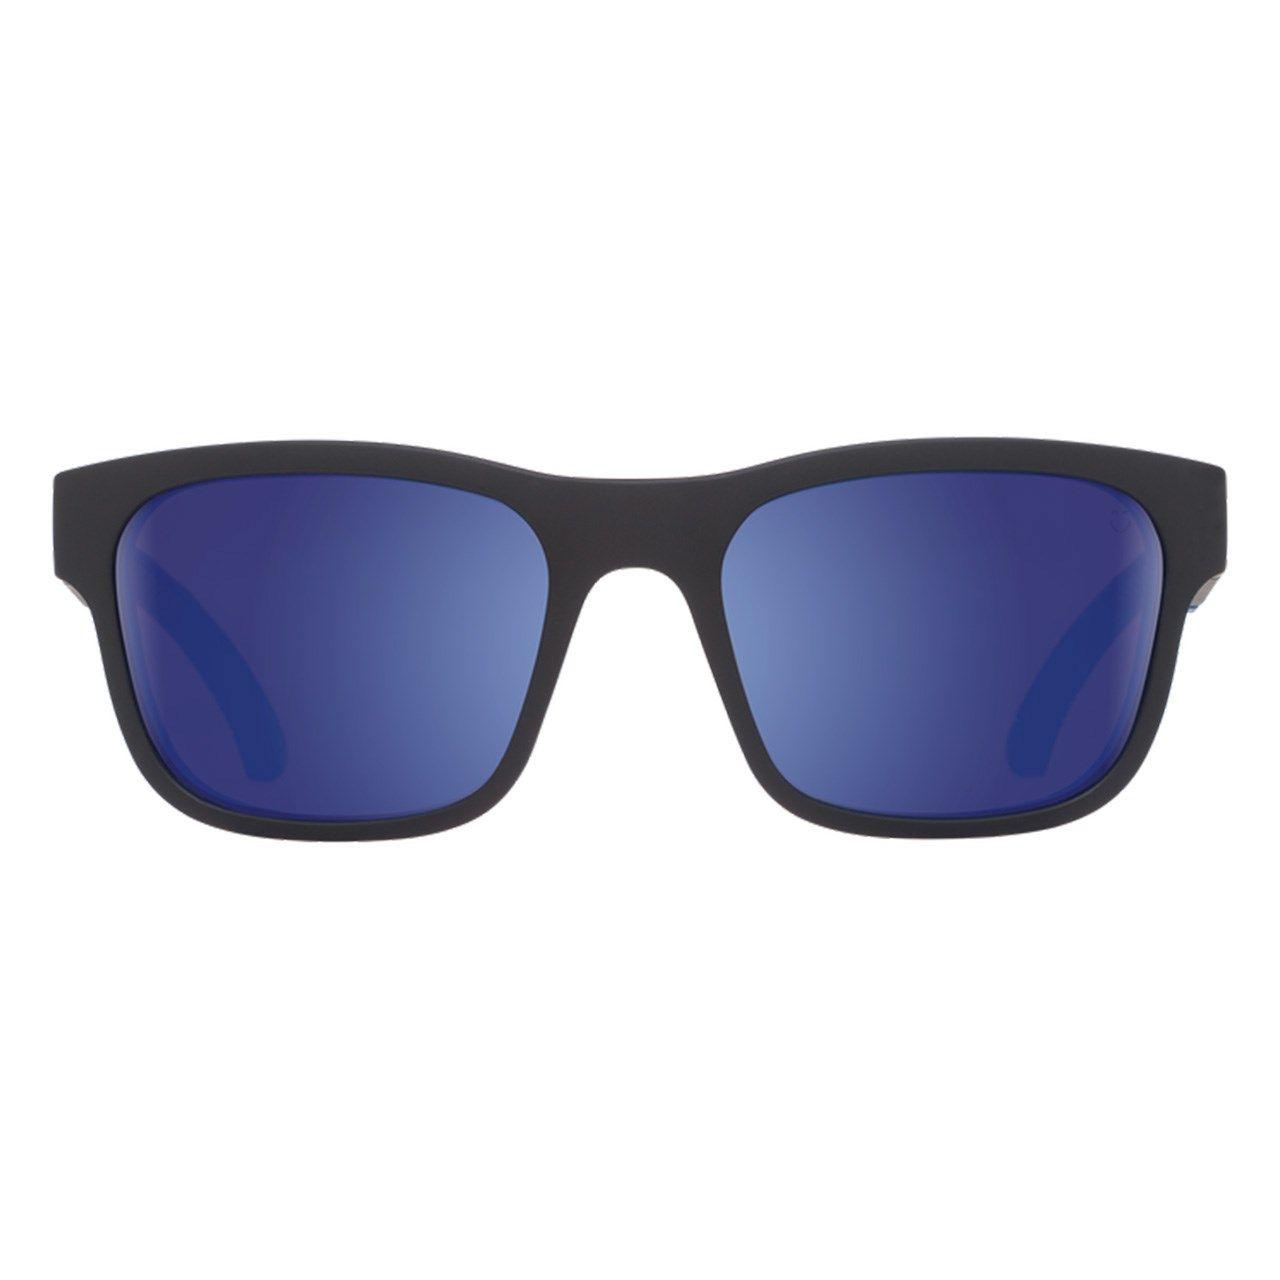 عینک آفتابی اسپای سری Hunt مدل Matte Black Navy Happy Bronze Polar Dark Blue Spectra -  - 1